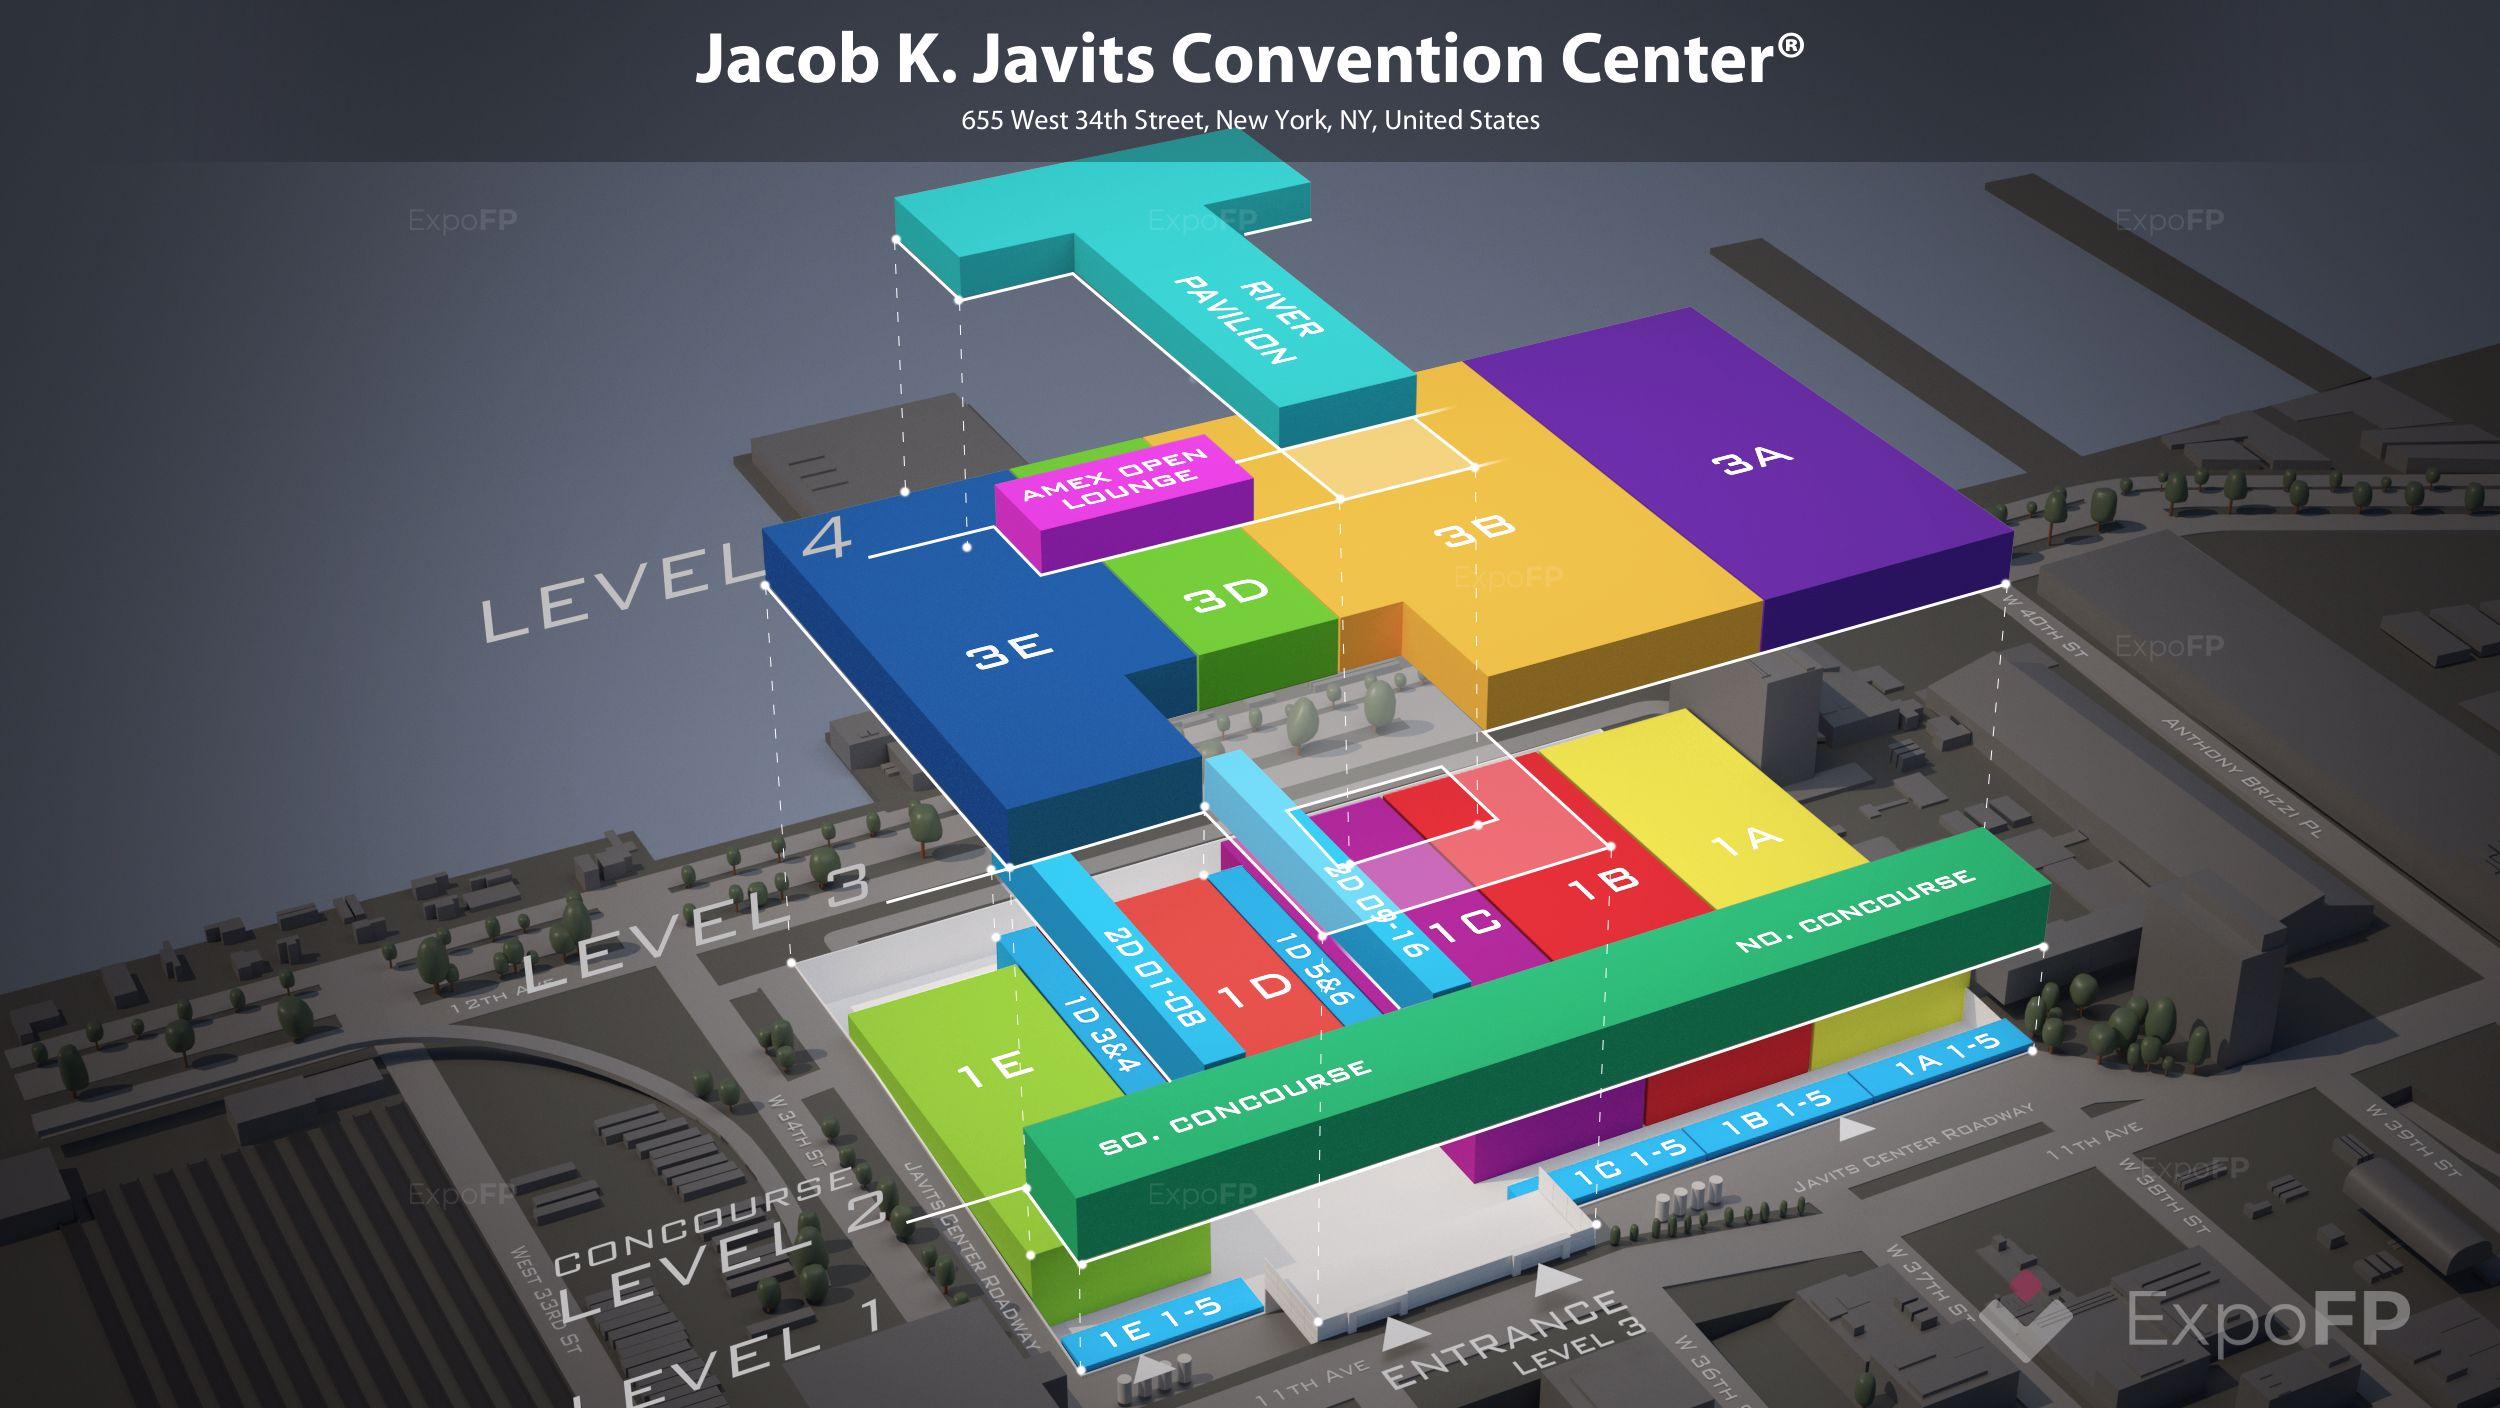 Jacob K. Javits Convention Center floor plan